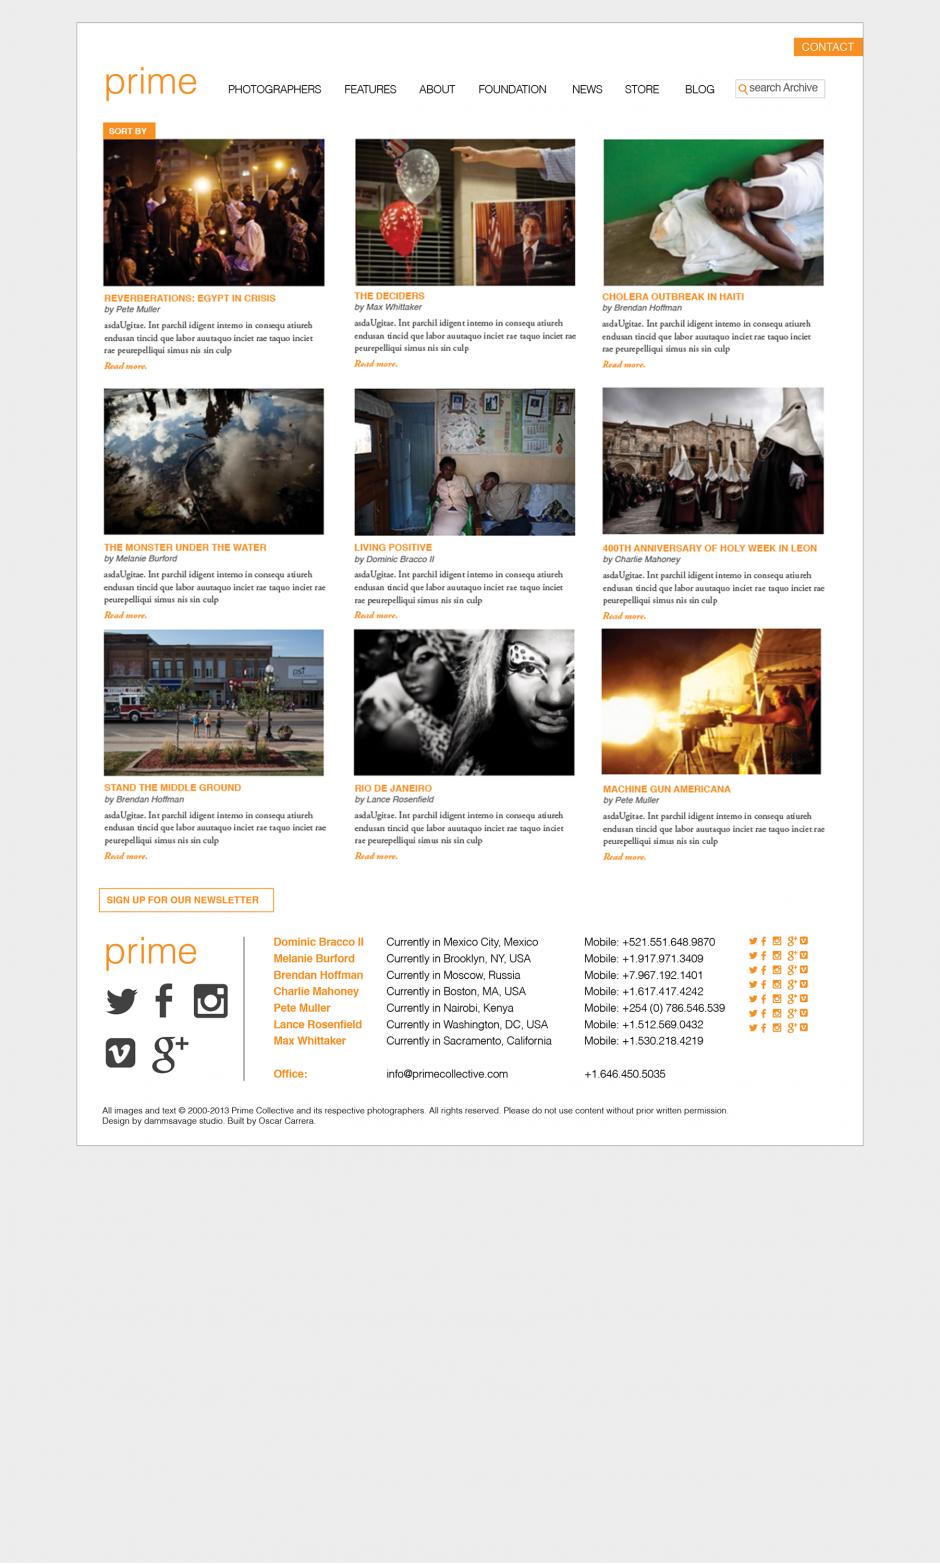 primewebsiteb